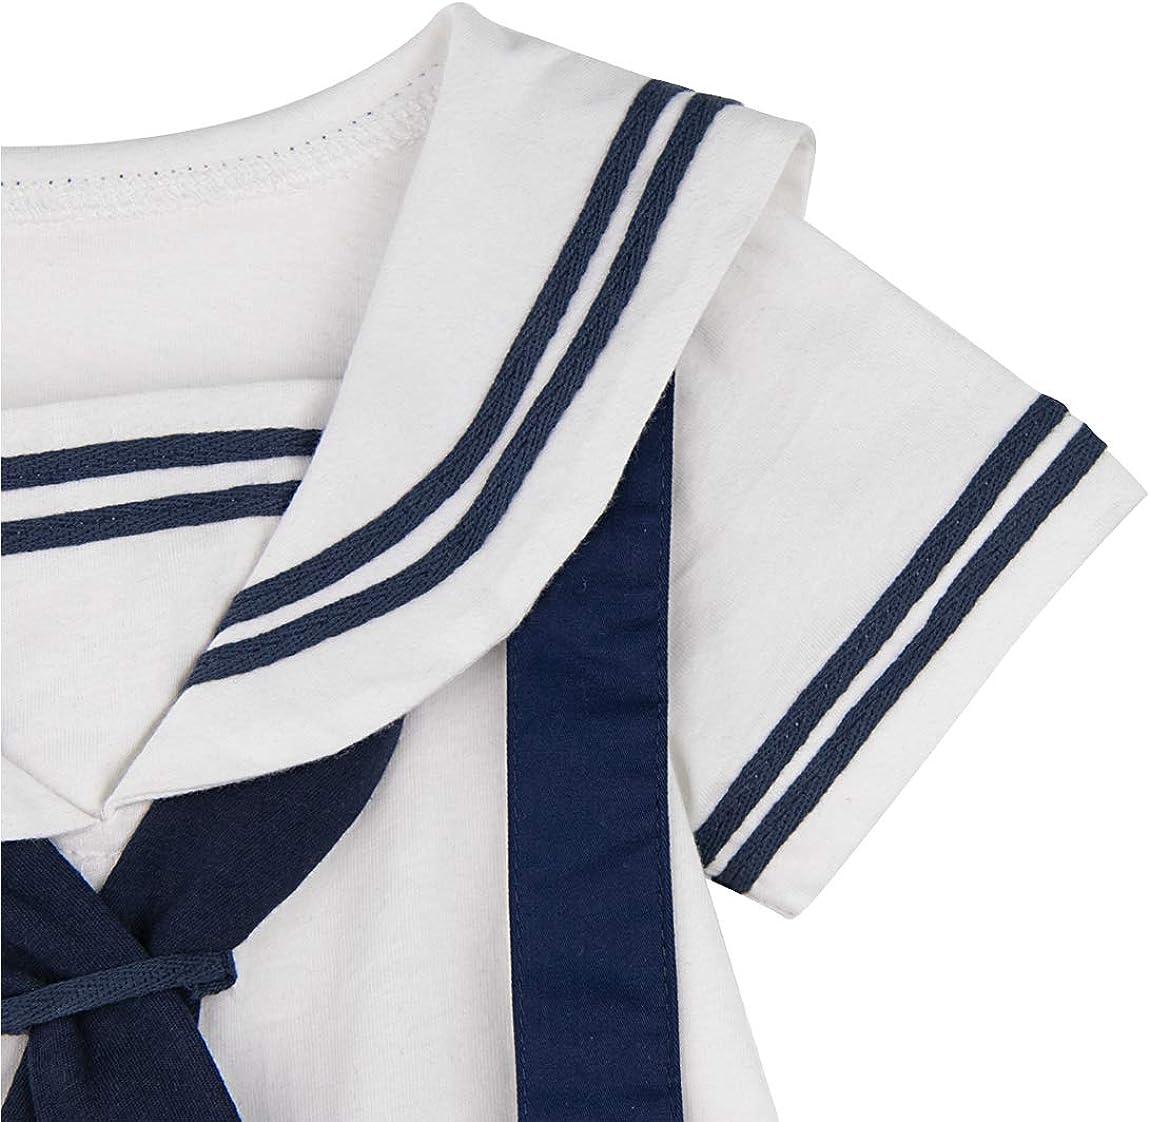 mintgreen Baby Boy Gentleman Romper 100/% Cotton Toddler Soft Jumpsuit Printed Bowtie Outfit 3-24 Months